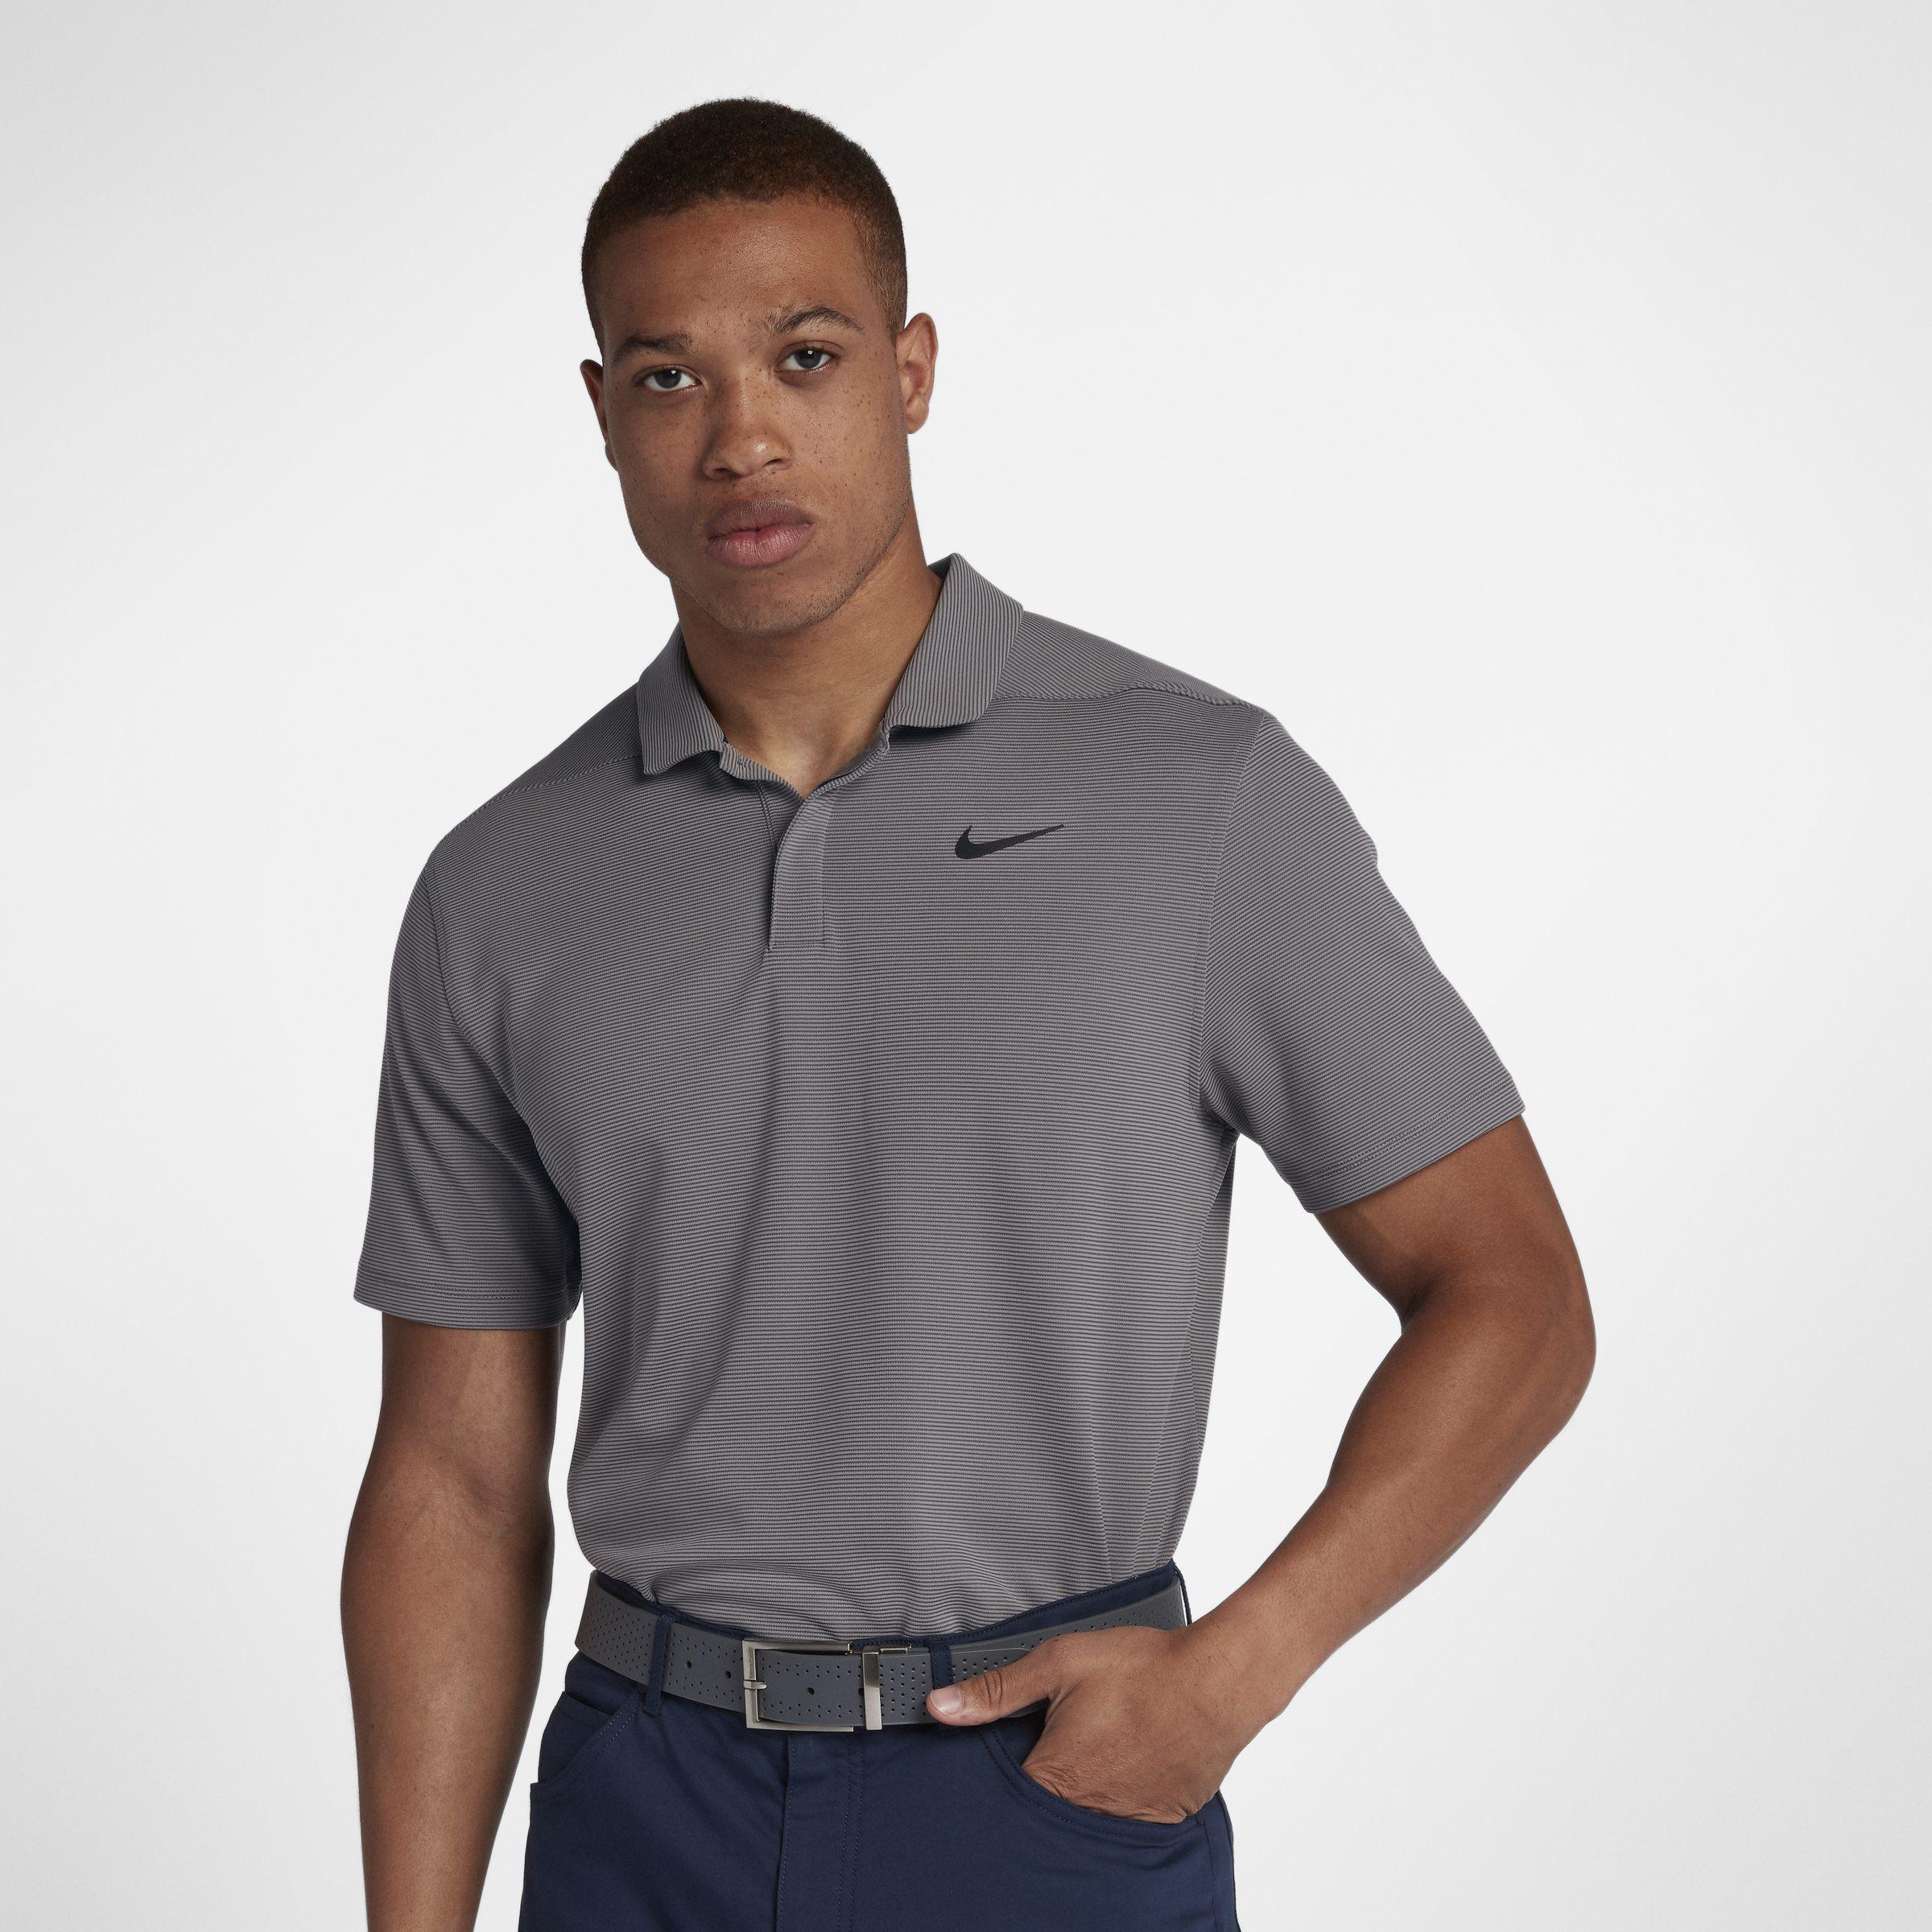 8db03eea Nike Aeroreact Victory Golf Polo in Gray for Men - Lyst